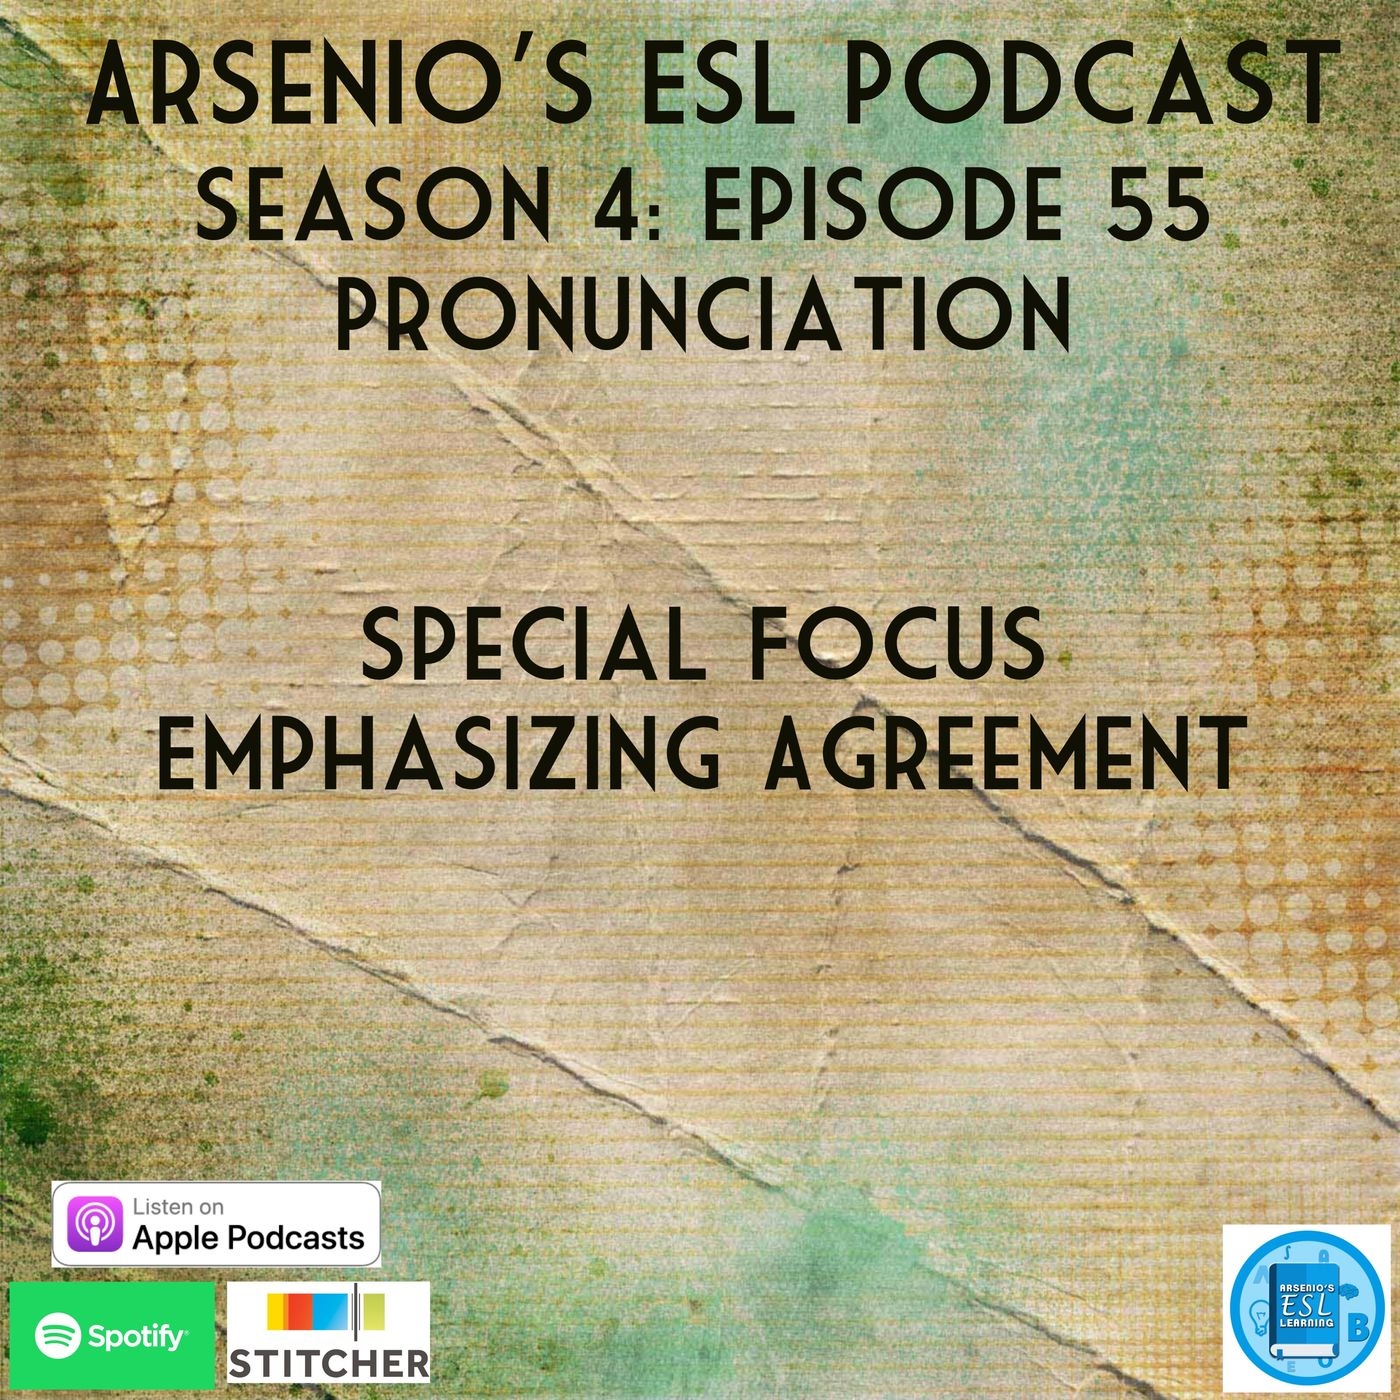 Arsenio's ESL Podcast: Season 4 - Episode 55 - Pronunciation - Special Focus - Emphasizing Agreement